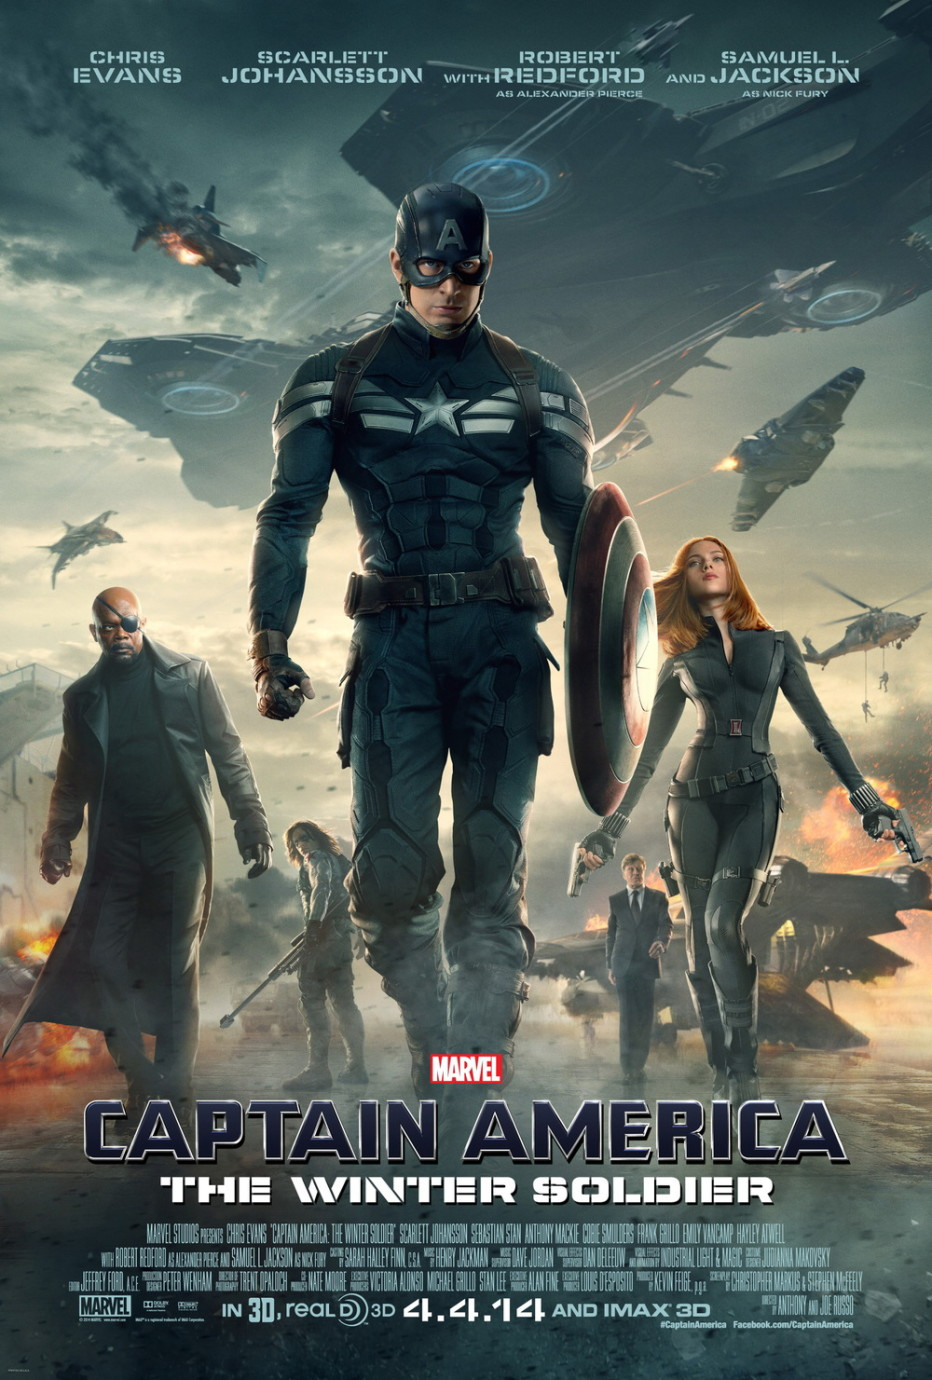 КАПЕТАН АМЕРИКА Captain America: The Winter Soldier